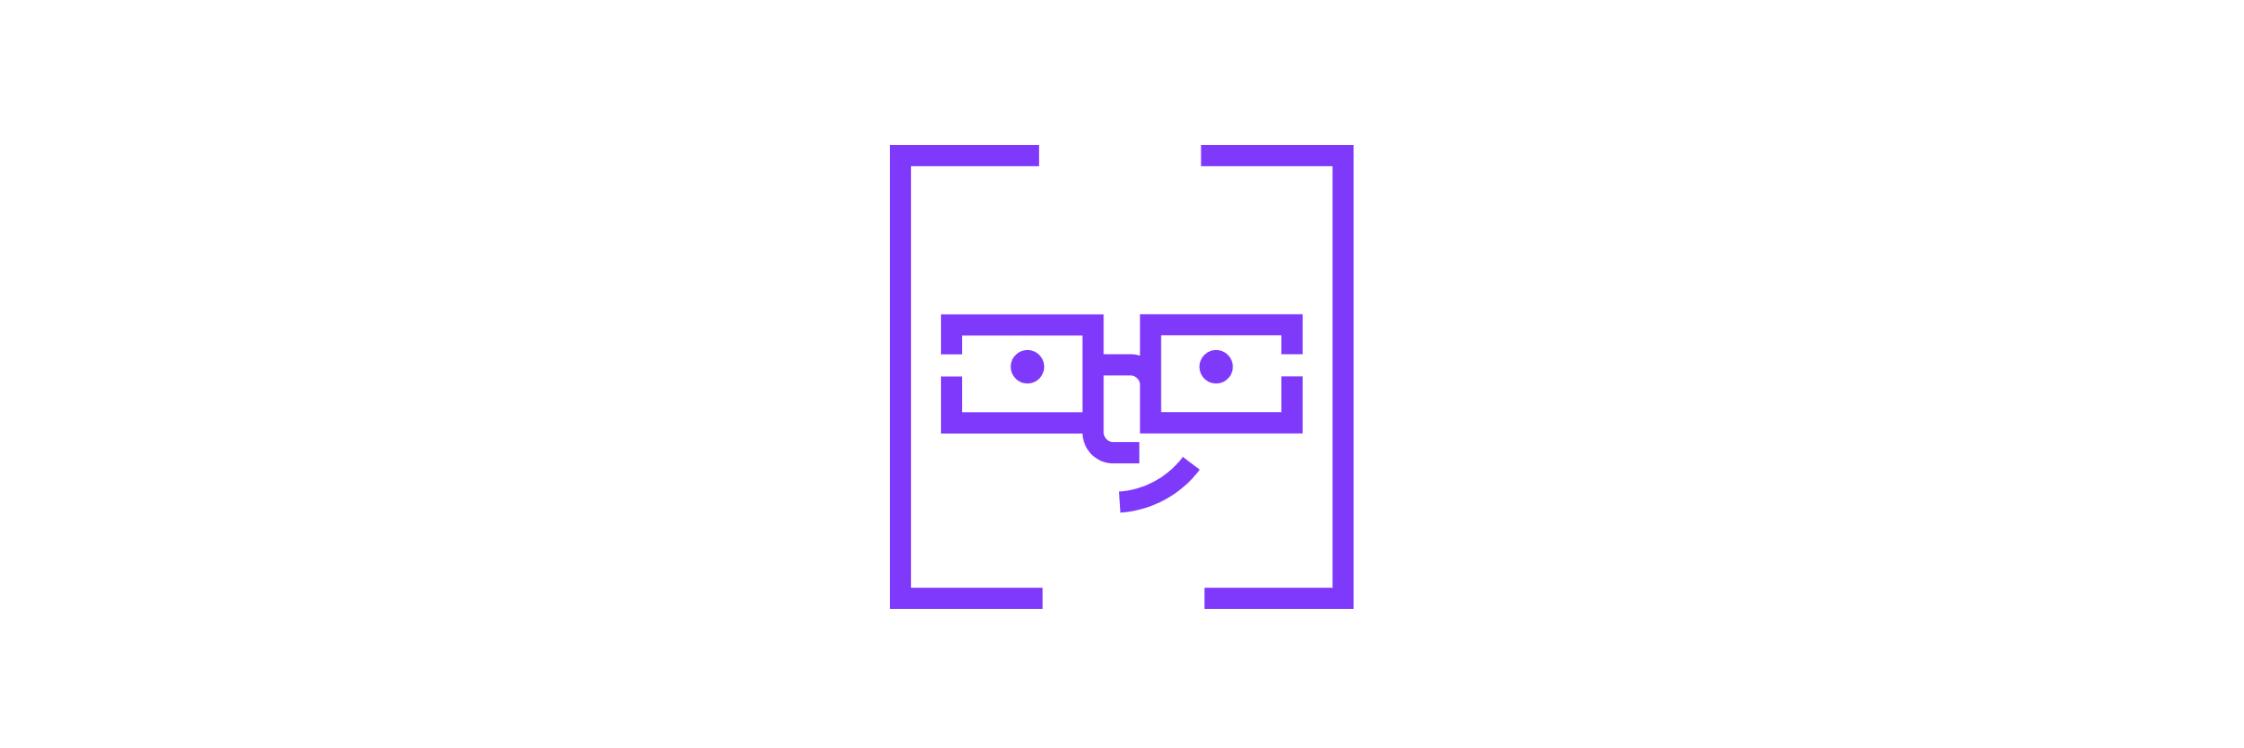 Mobile app development process. Nerdy face